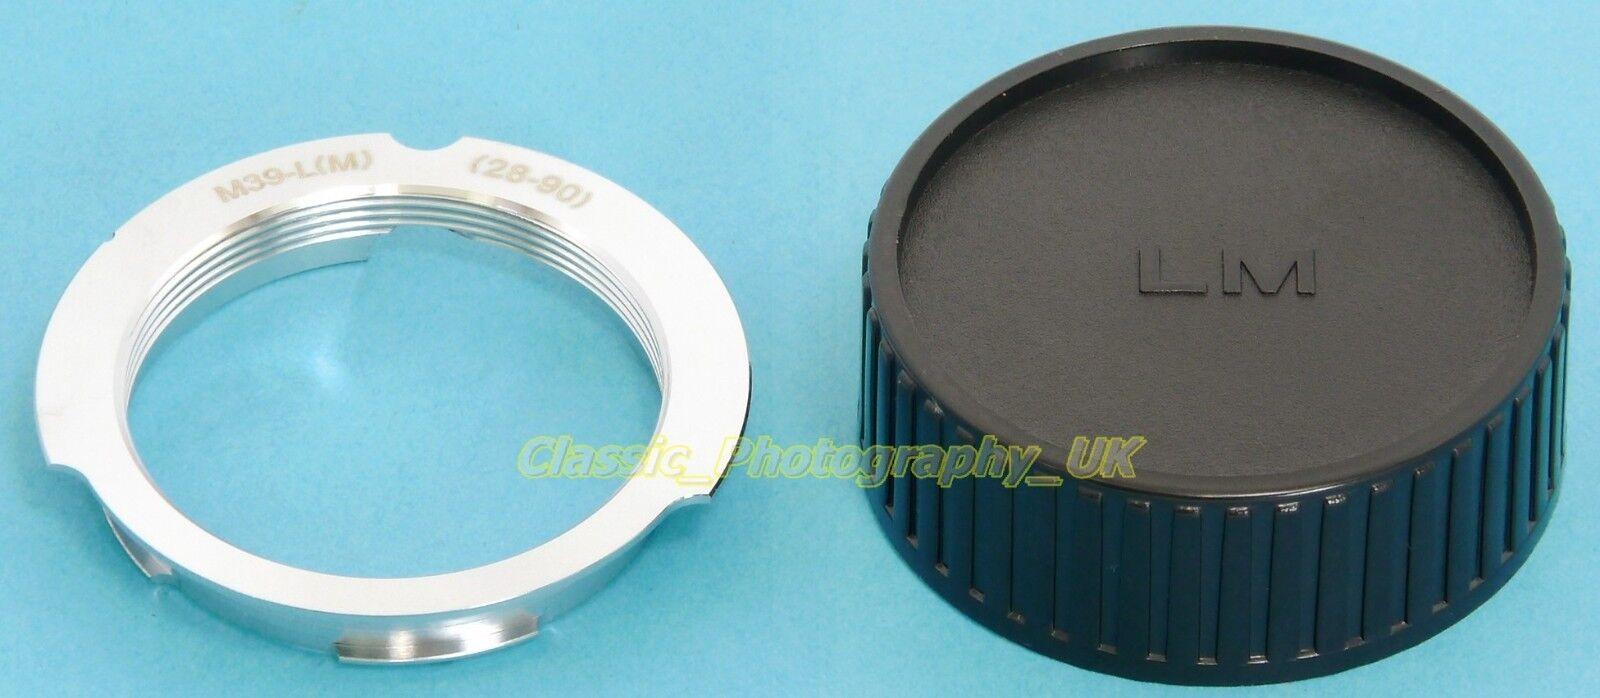 LEICA Screw to LEICA M Adapter 28-90mm LTM Lenses on Leica M Camera as M8 M7 M6